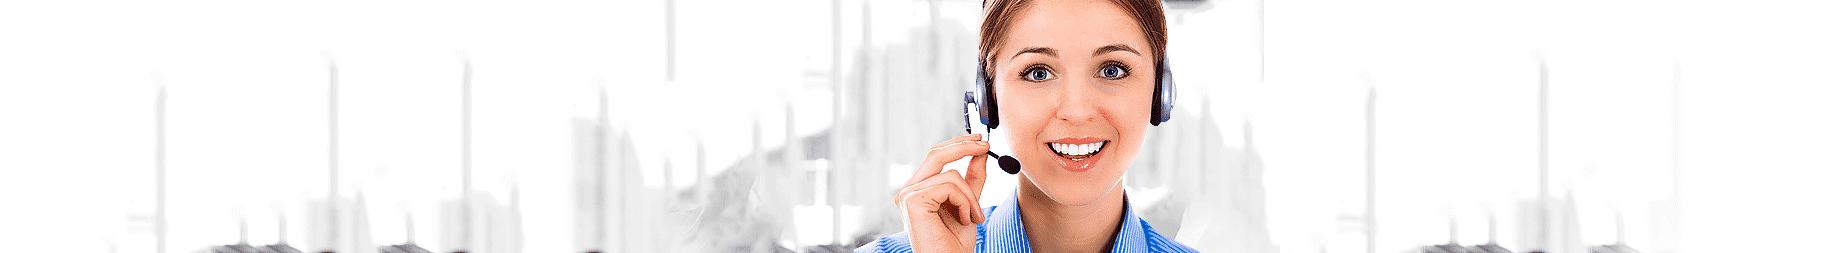 Below Market Pricing | Call Center Service | International | Call Center Company